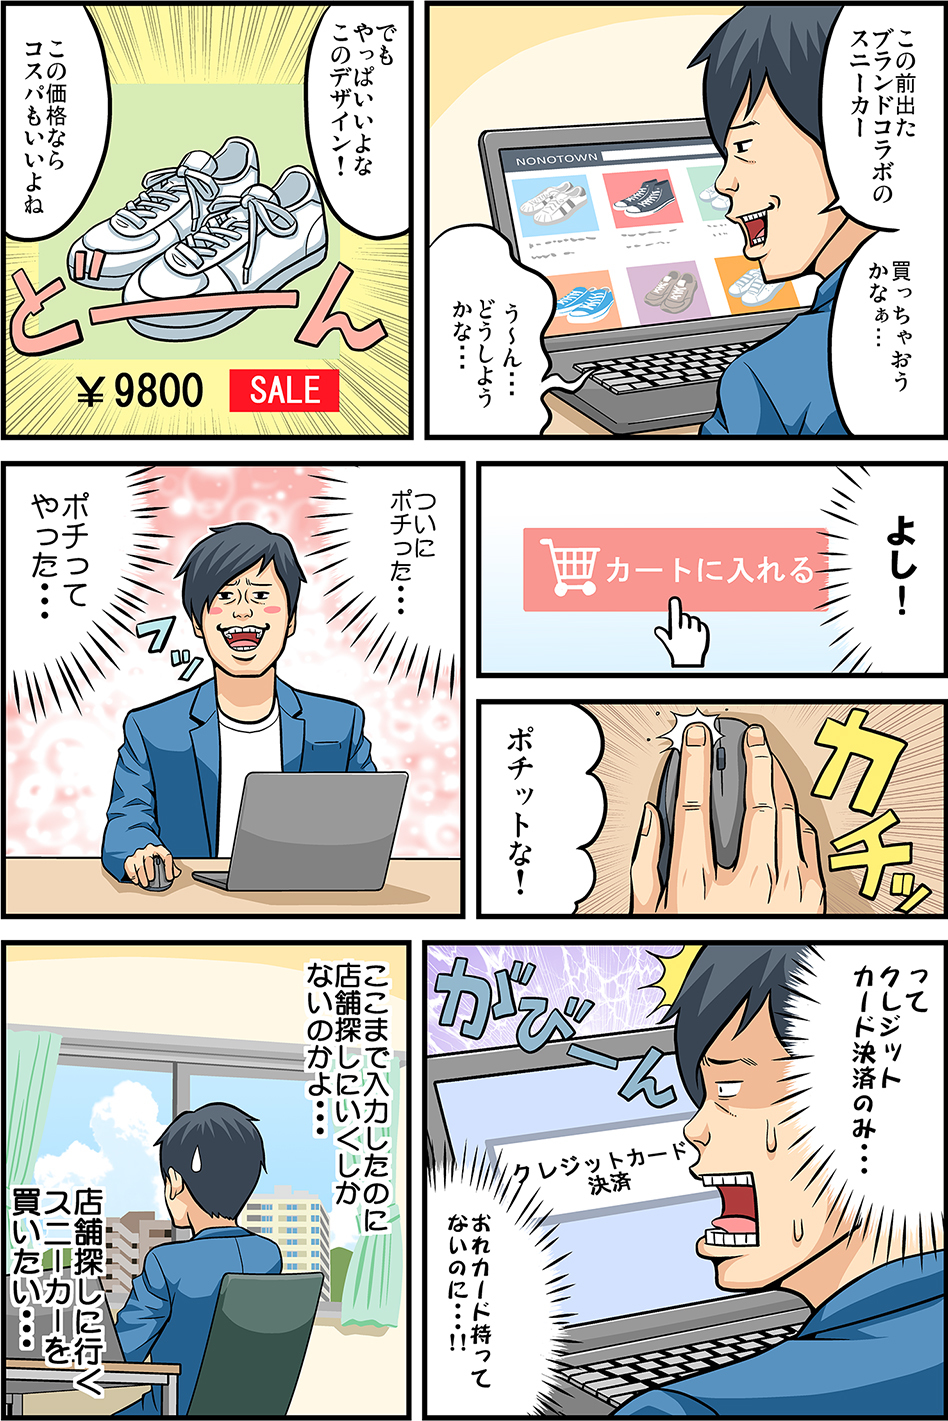 cca_sec1_comic.jpg